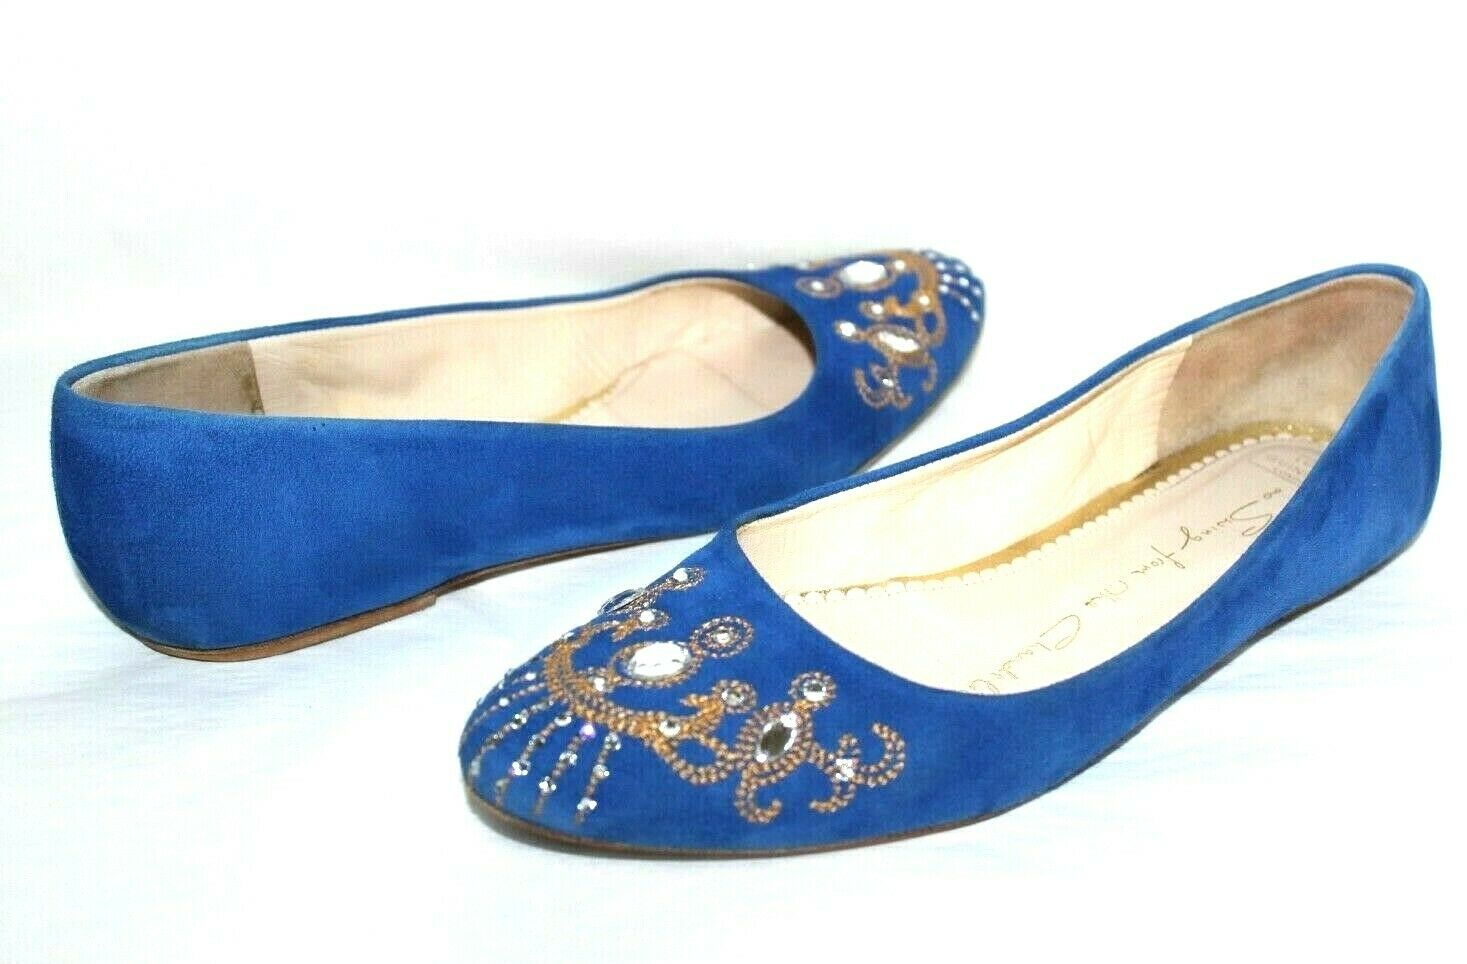 ❤️ Lulu Guinness Swing de La Lustre Bijou Daim Bleu Plat 37 Espagne L @@ K26